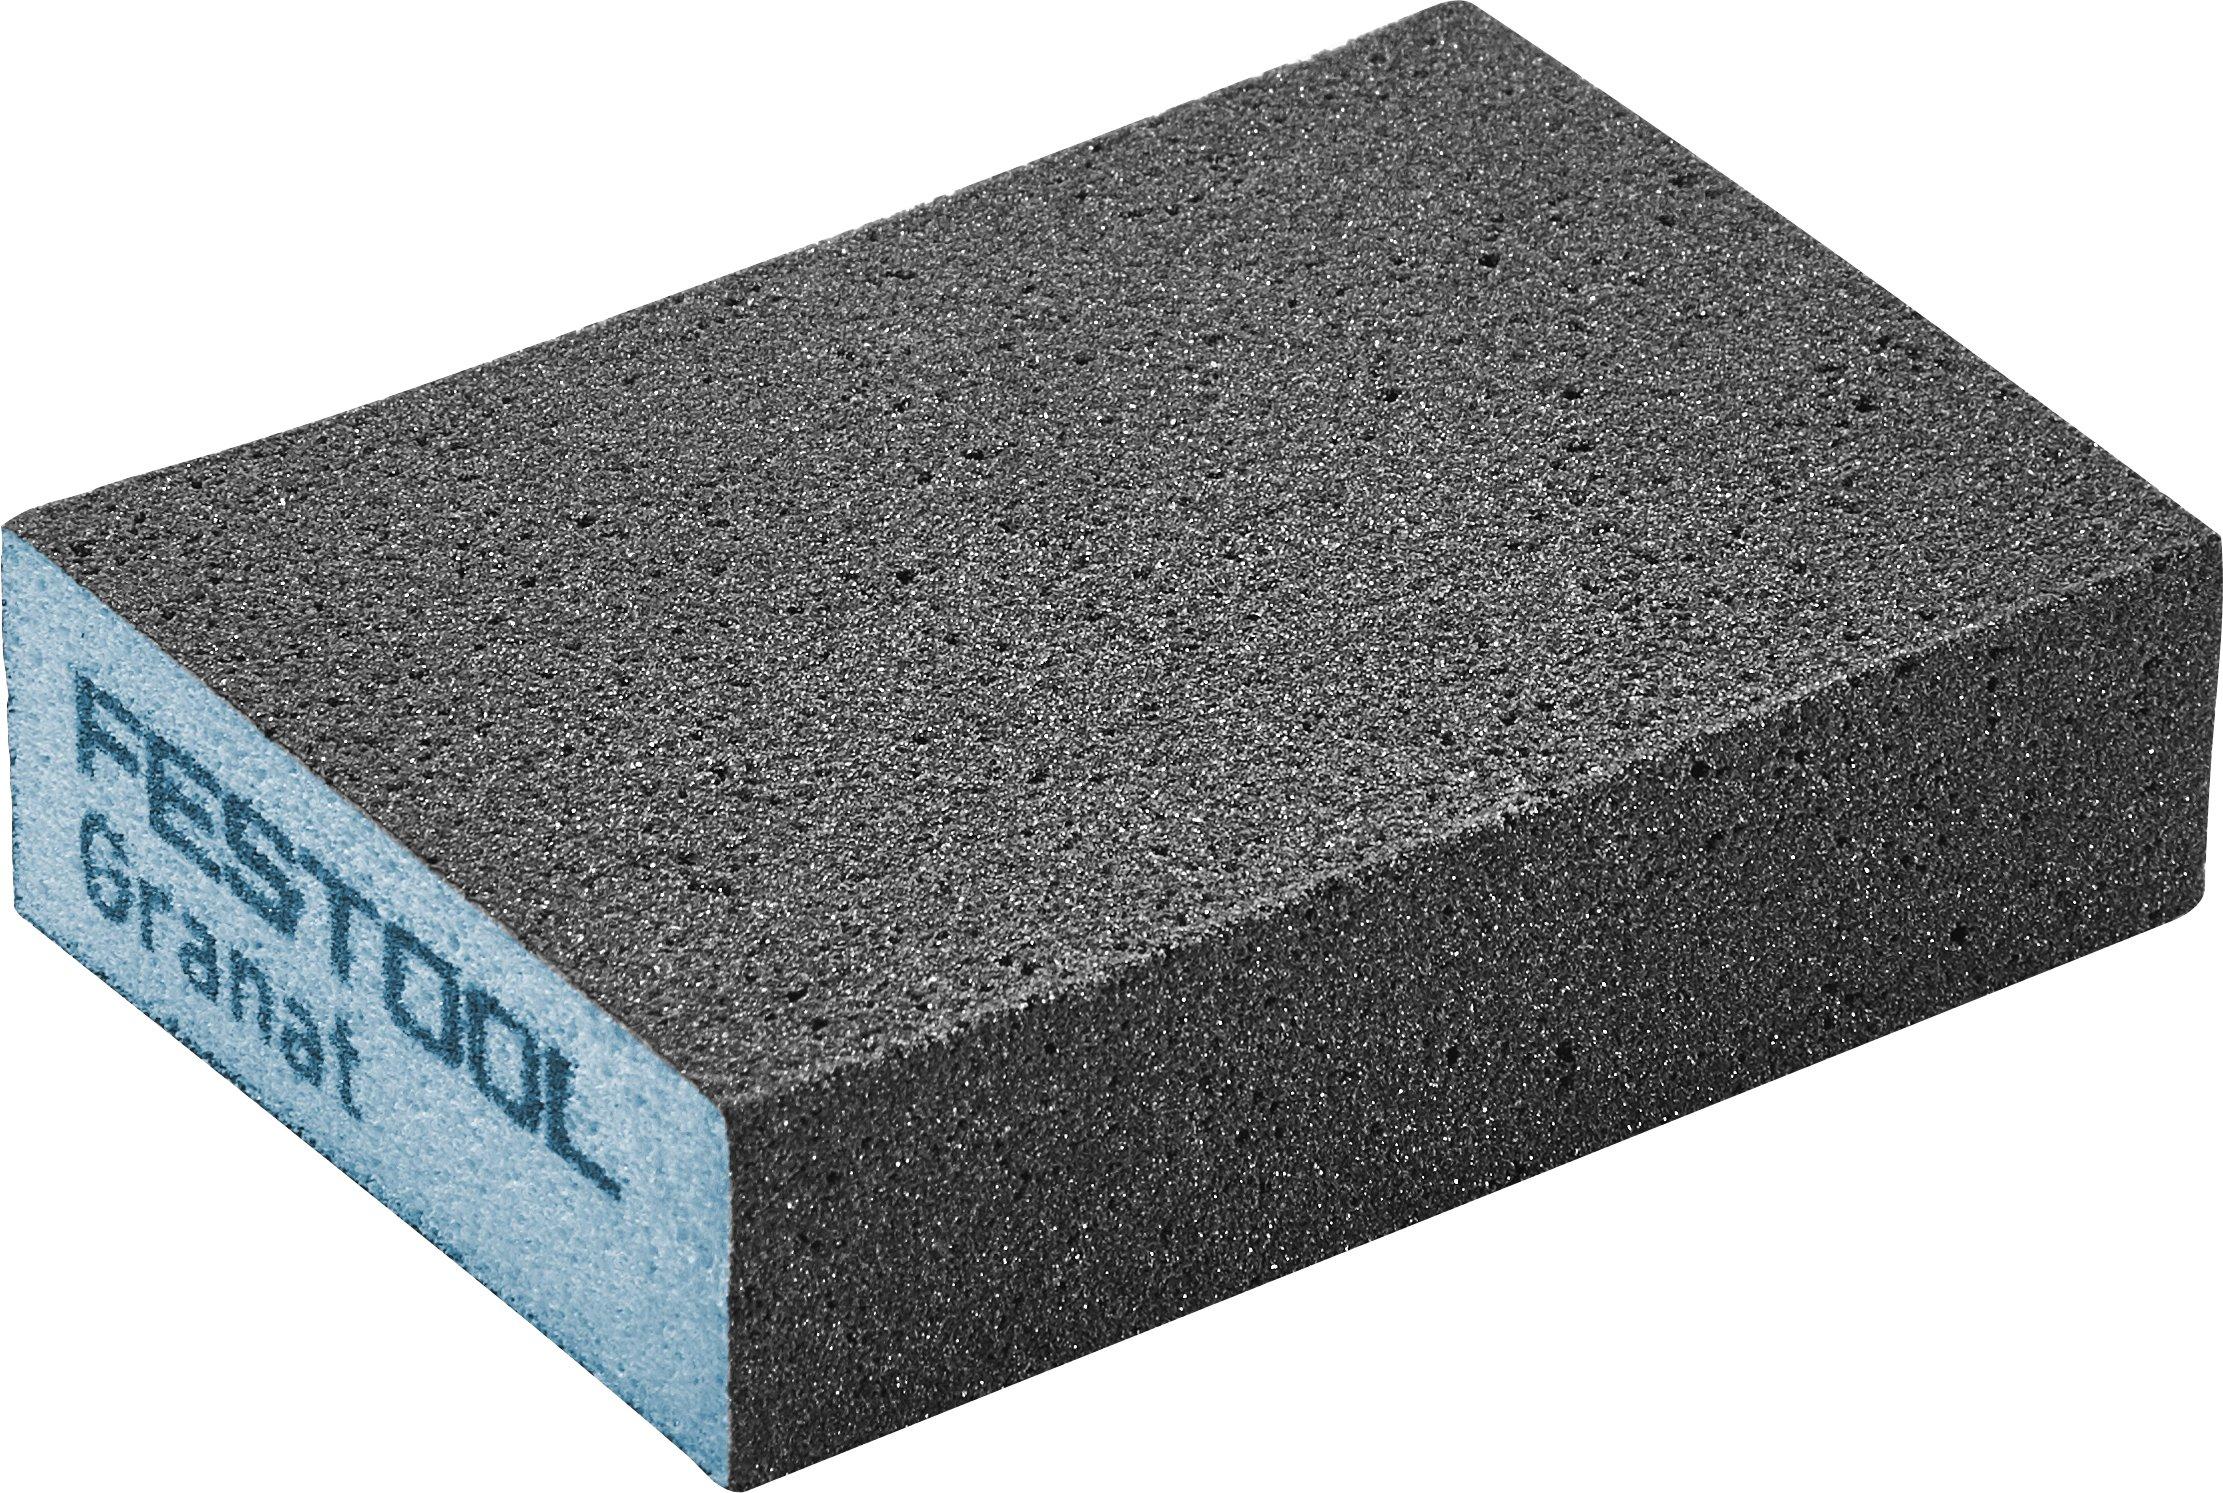 Festool 201083 GRANAT Abrasive Sponge